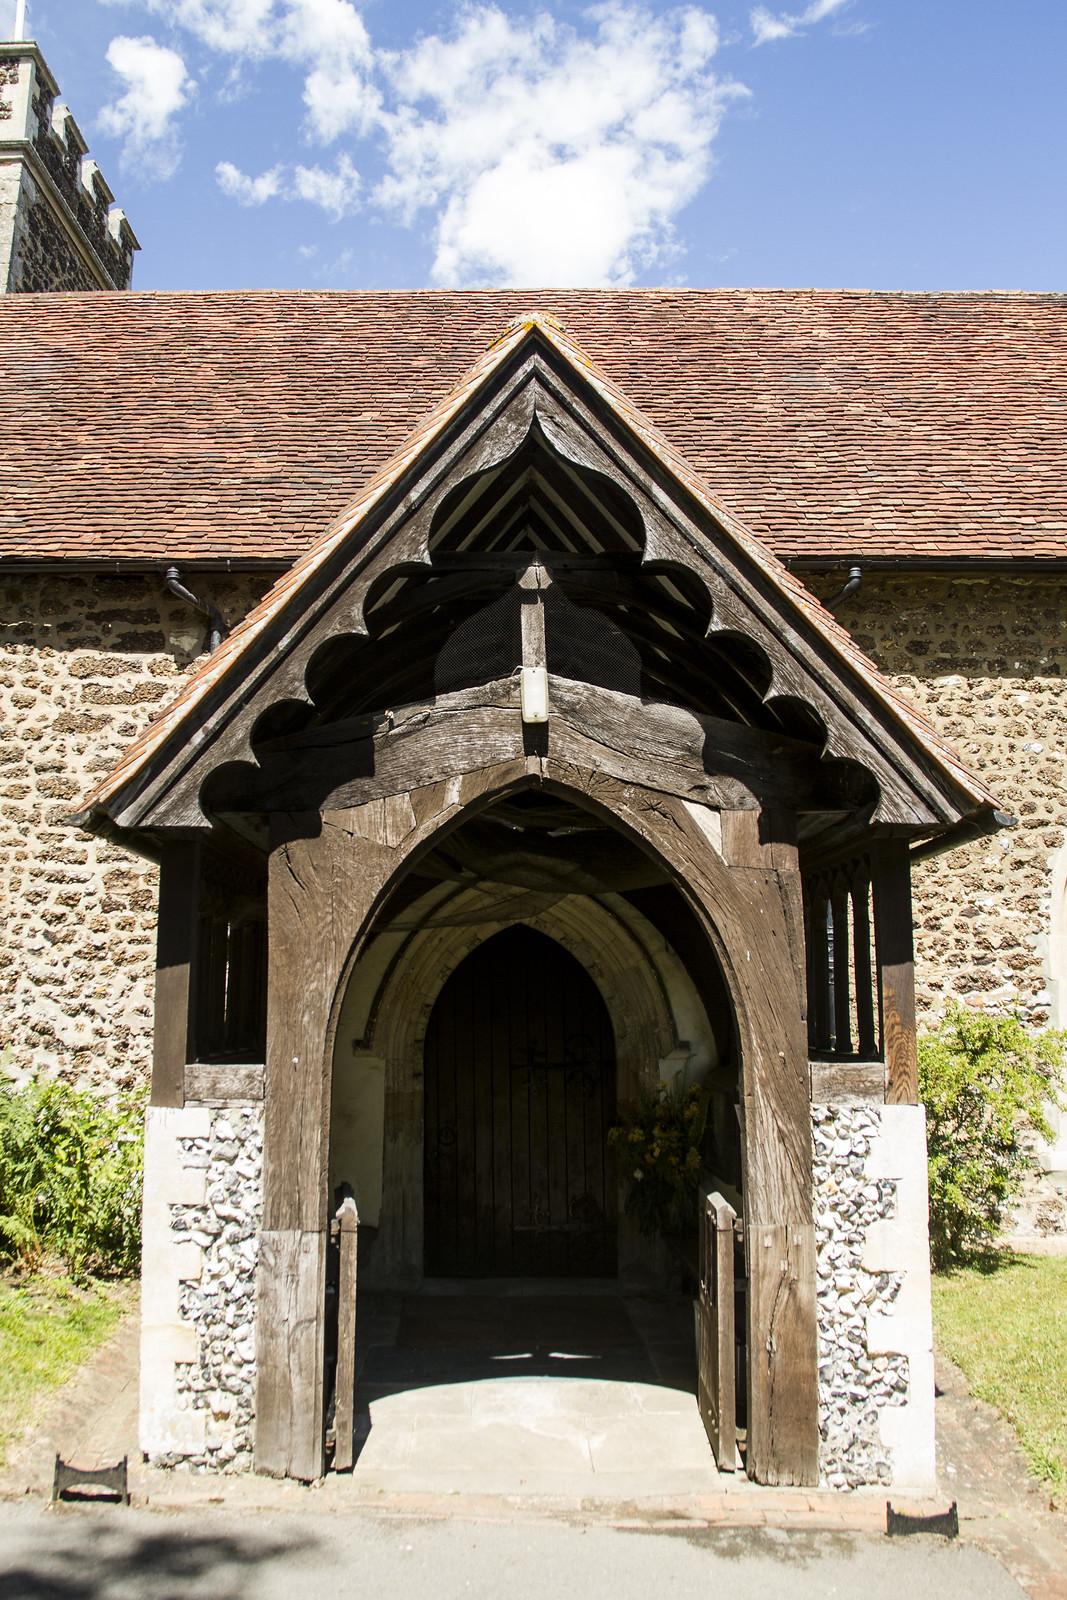 All Saints' entrance